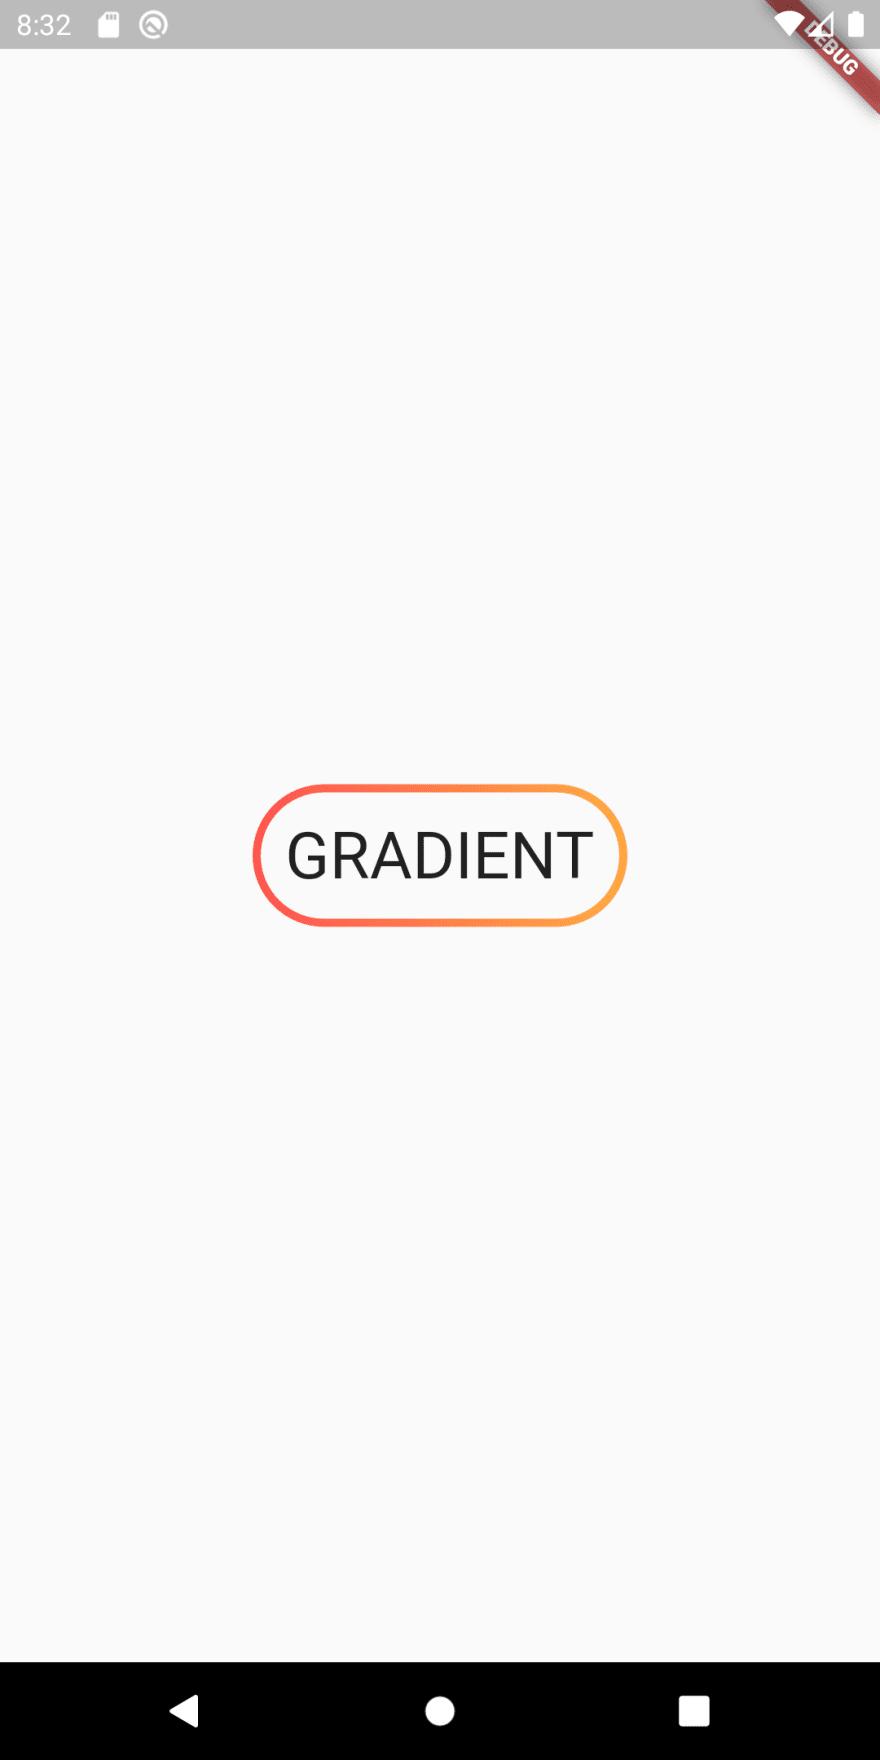 Round gradient border around text with padding